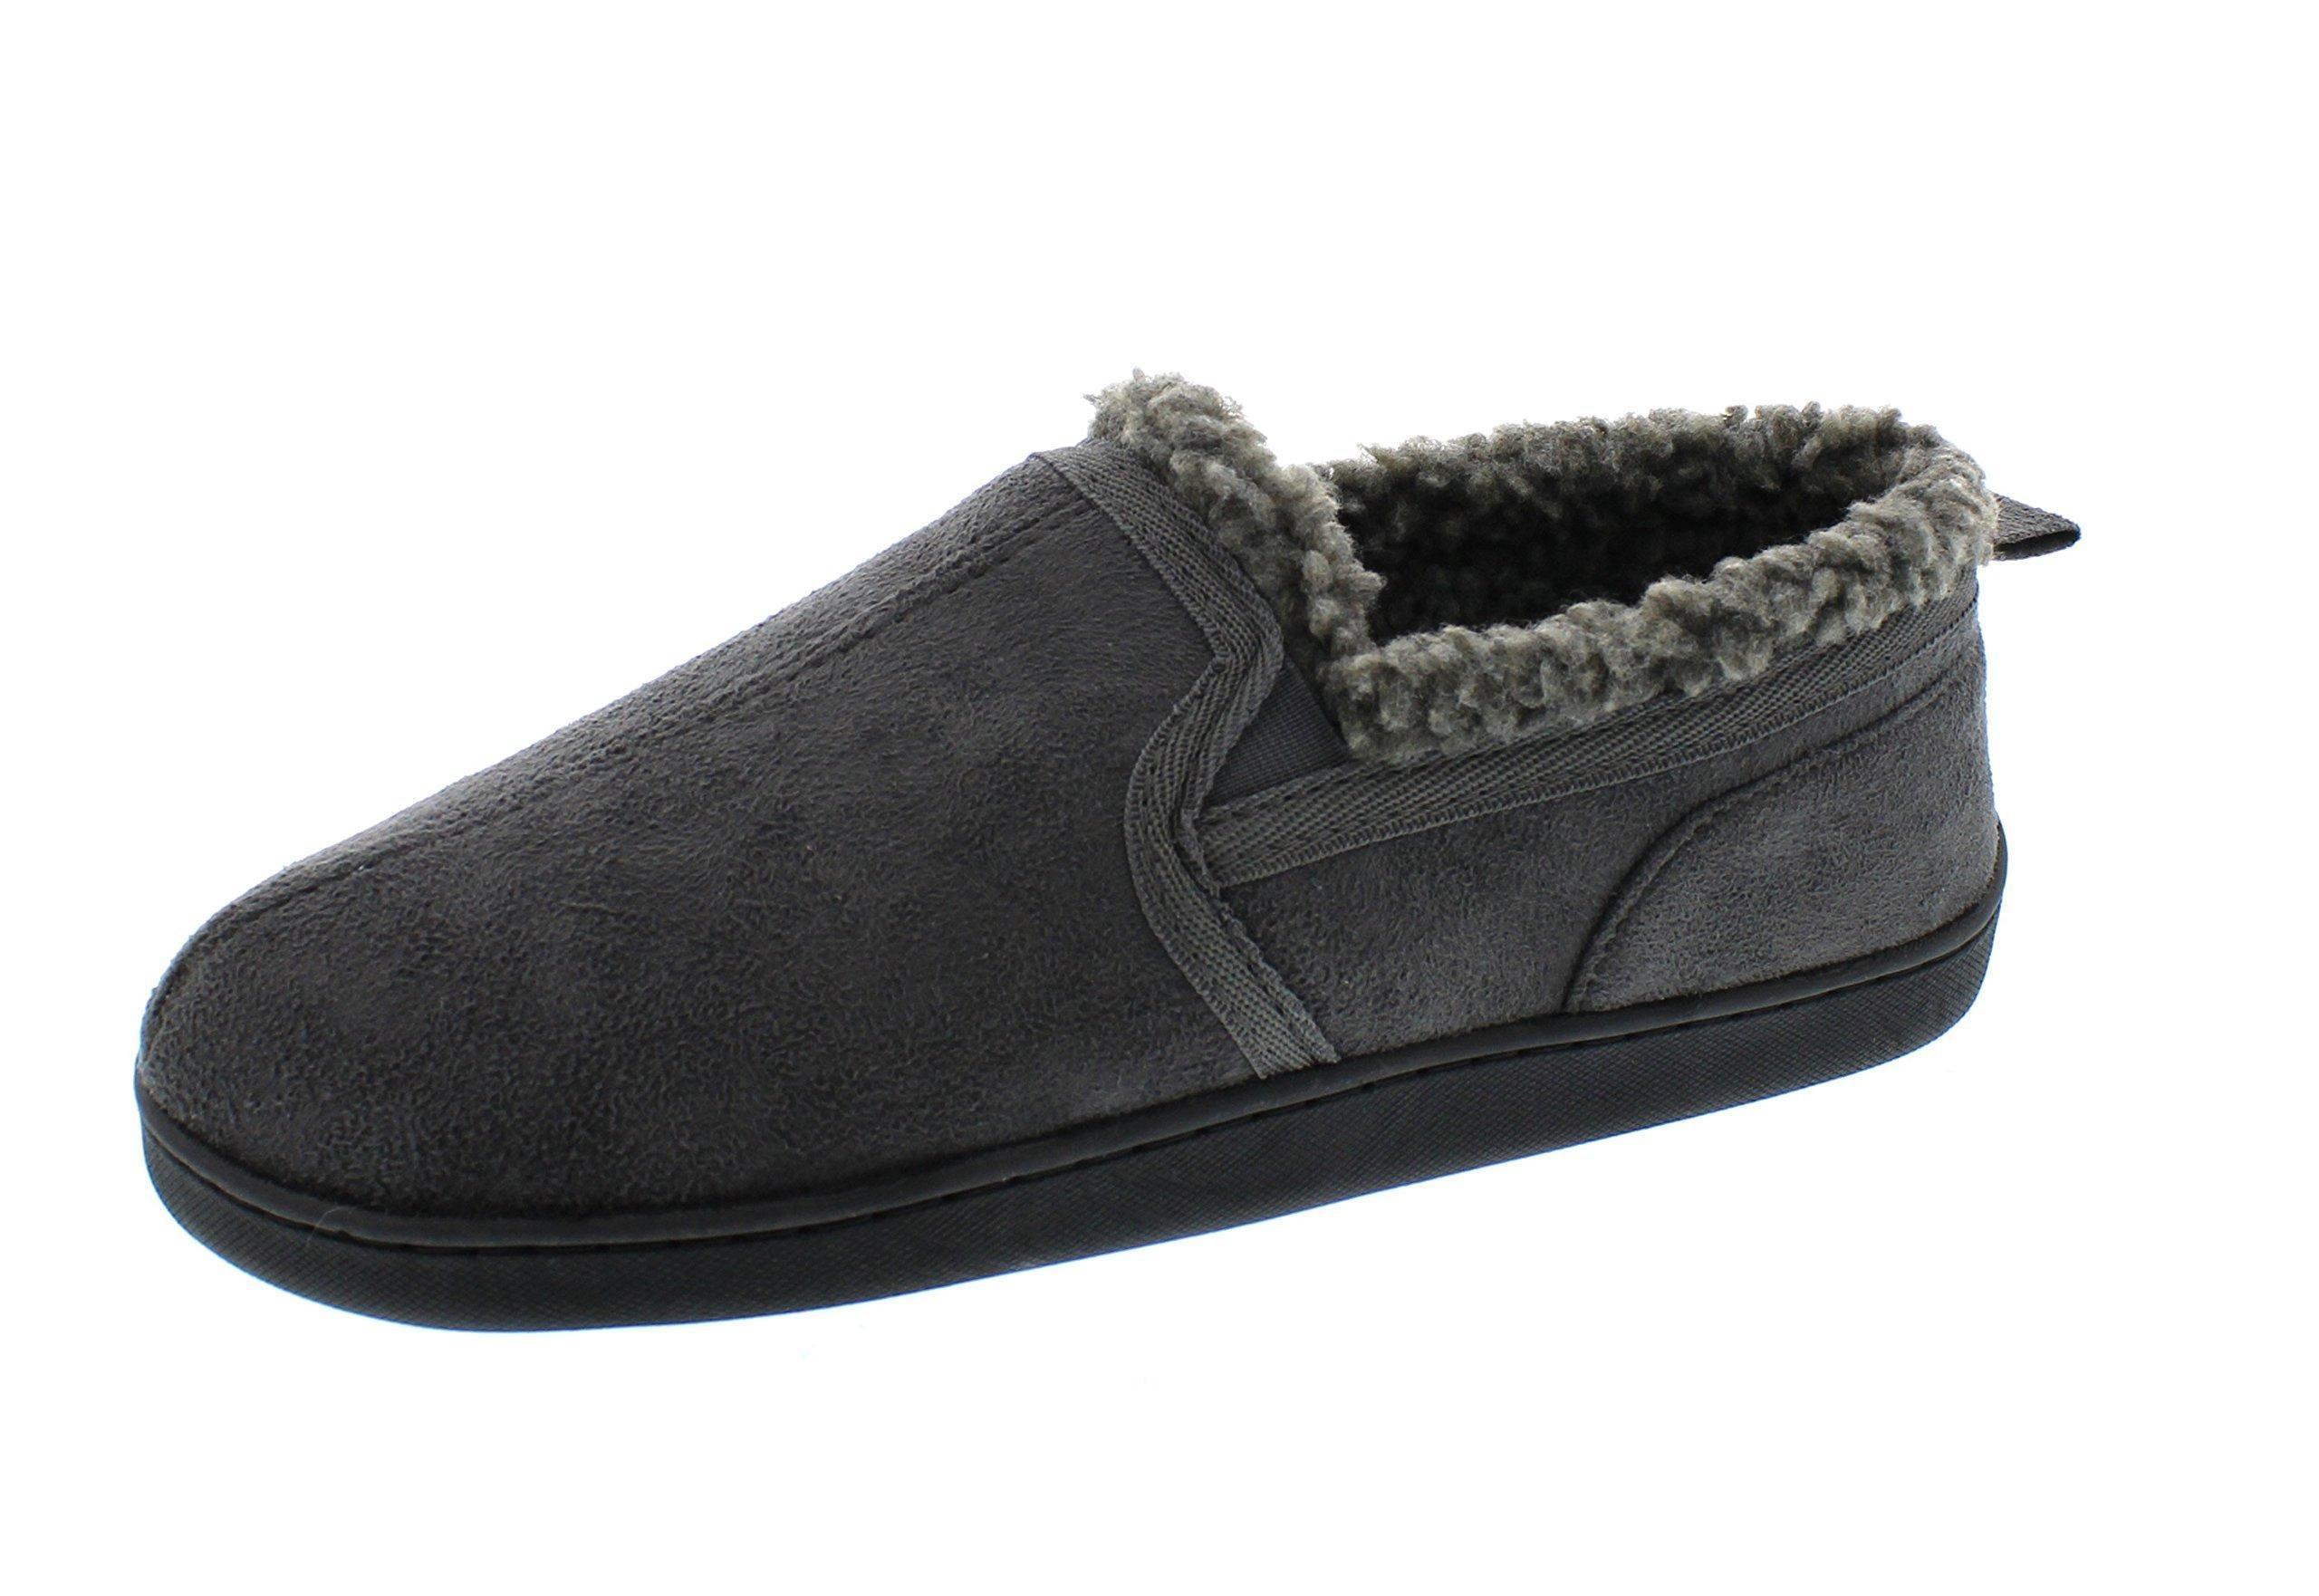 Gold Toe Men's Norman Memory Foam Slip-On Microsuede Sherpa Lined Casual Slipper Loafer Shoe Grey L 11-12 US